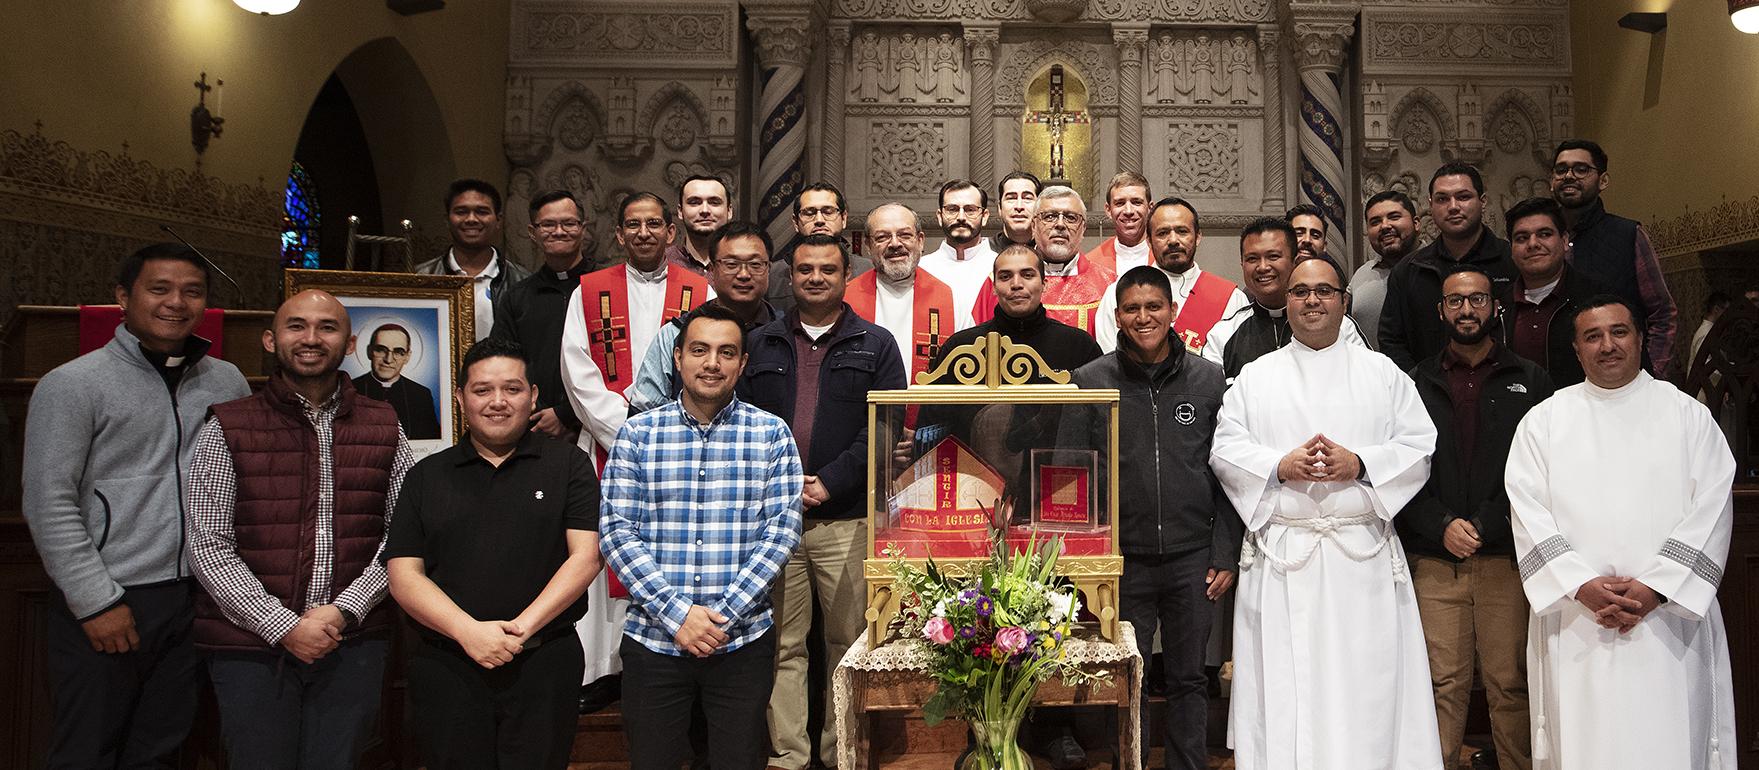 'SAN ROMERO VIVIÓ HACIENDO LA VOLUNTAD DE DIOS'